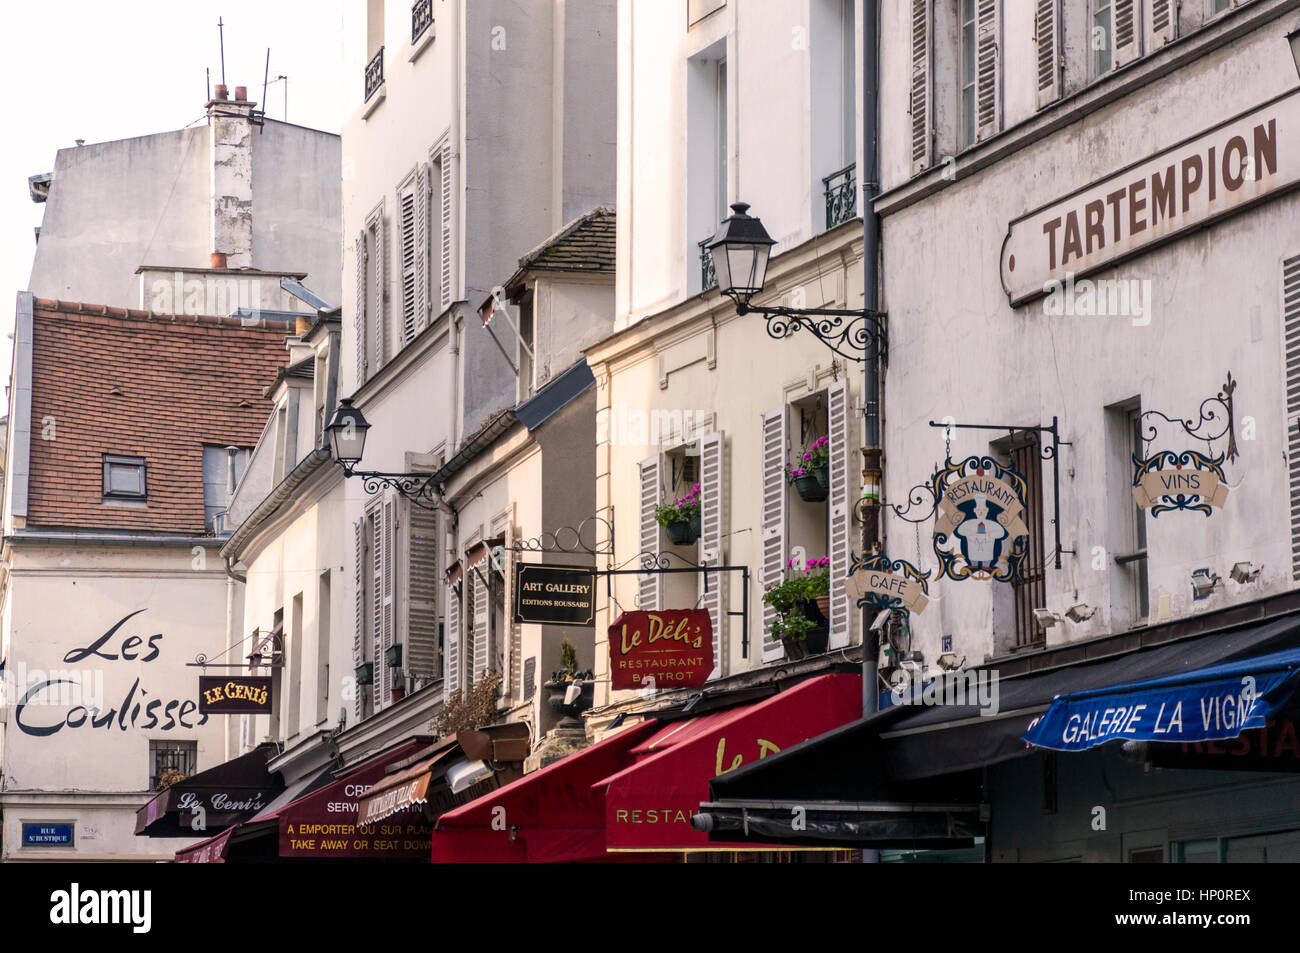 Cafes and bistrot in Place du Tertre, 18th arrondissement Paris, Montmartre, France - Stock Image